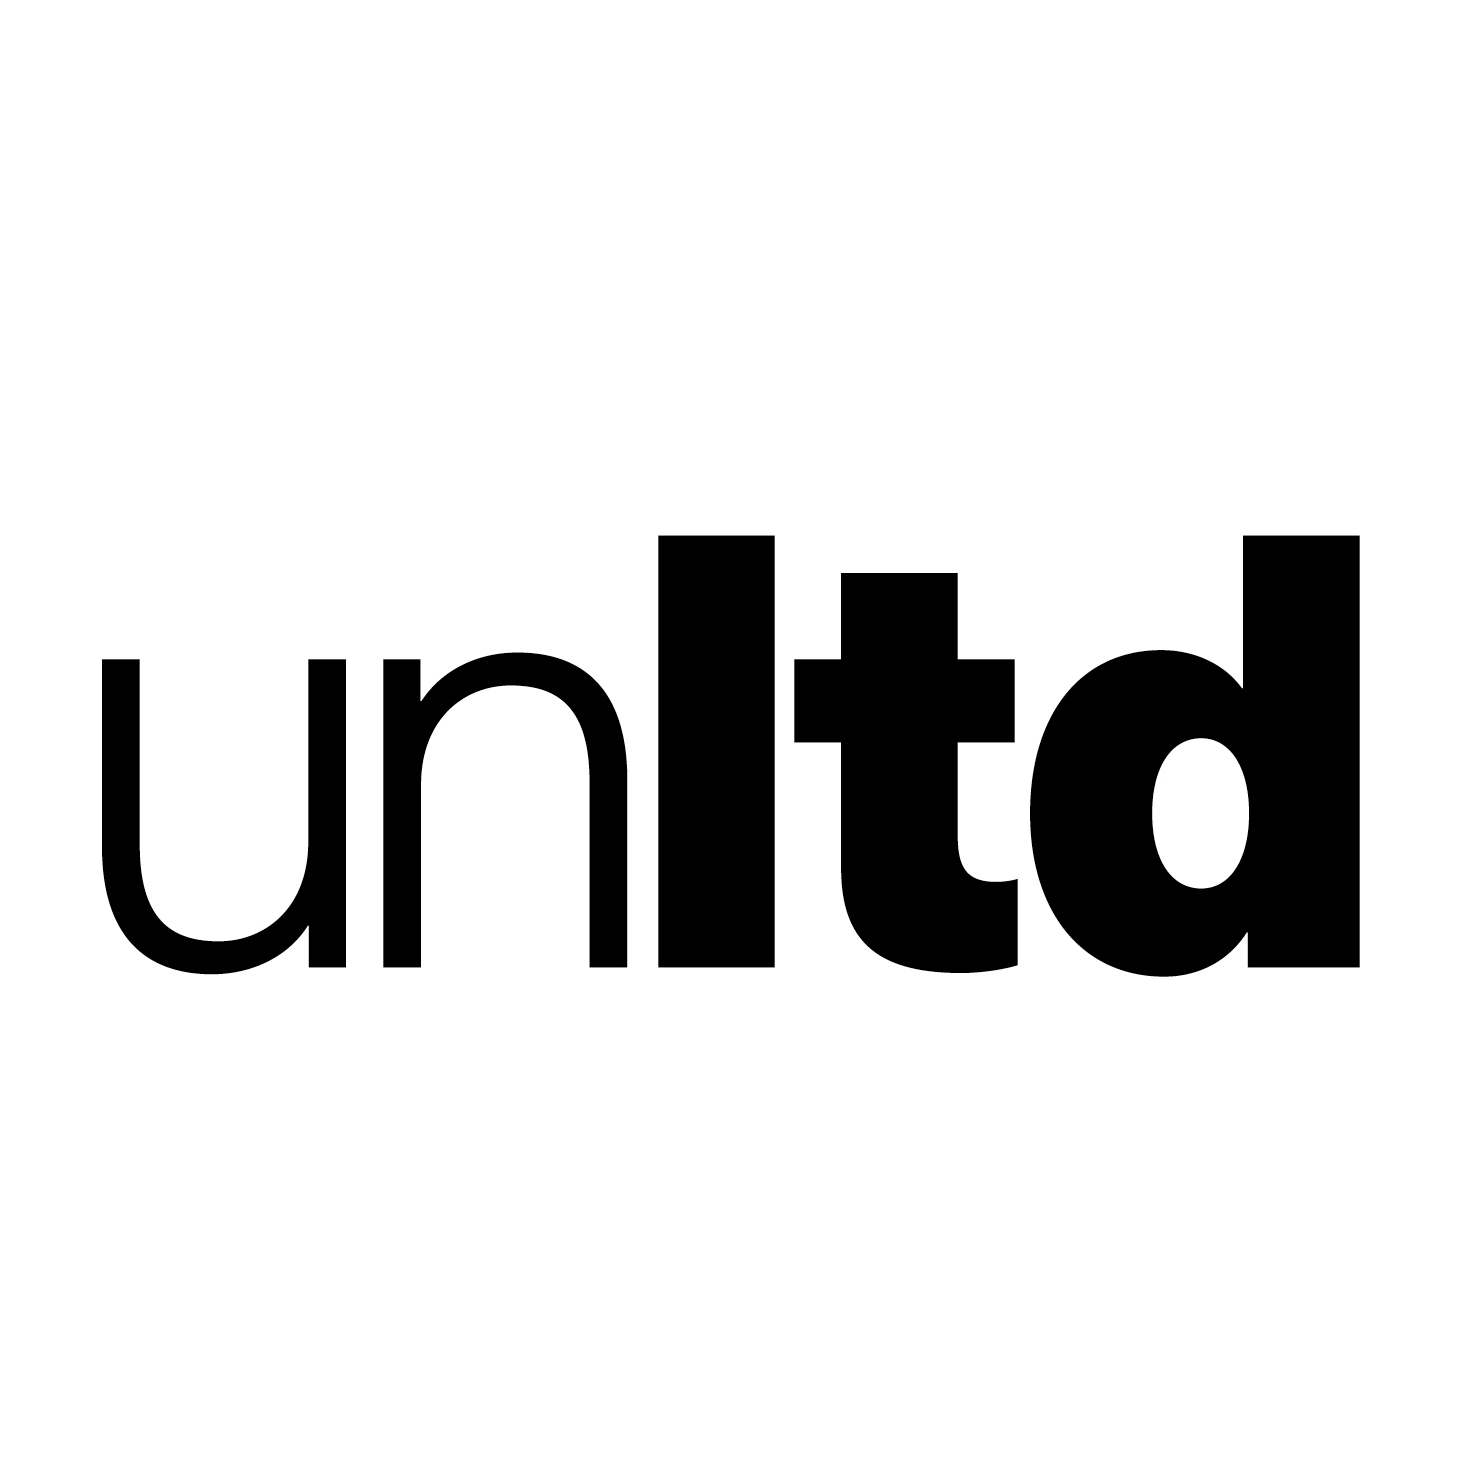 Cover image: unltd